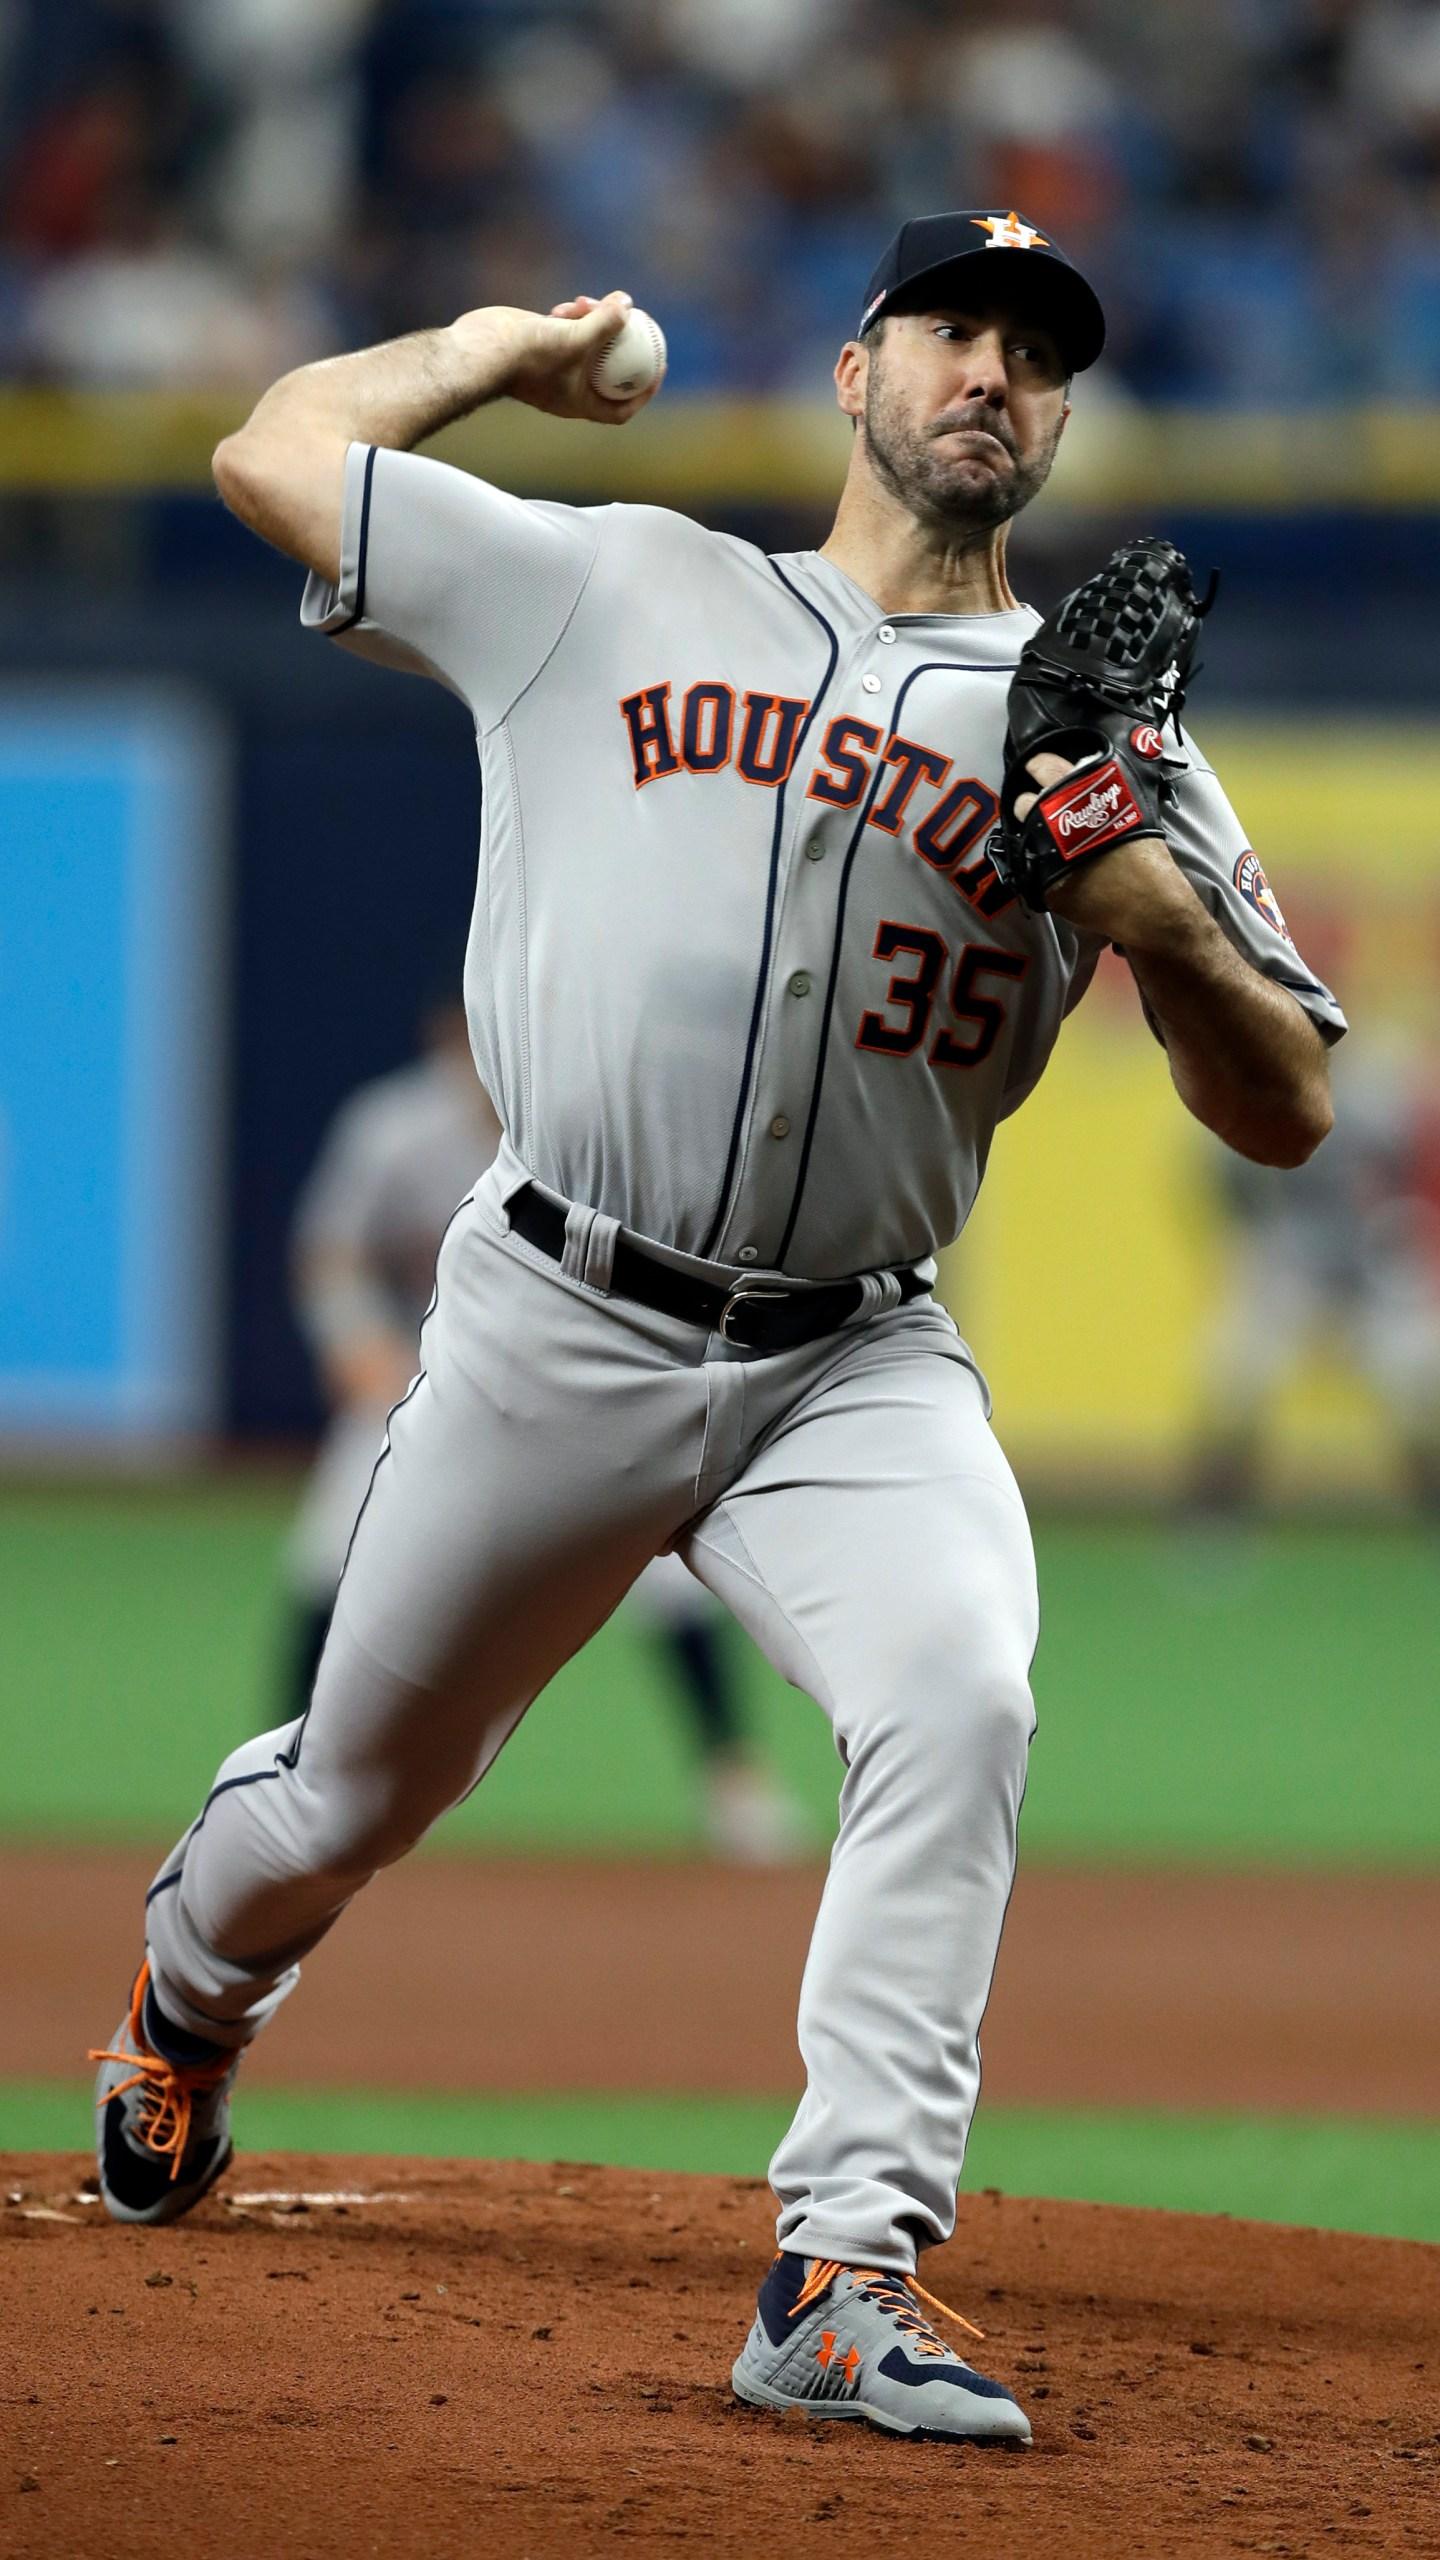 Astros Rays Baseball_1553828829381